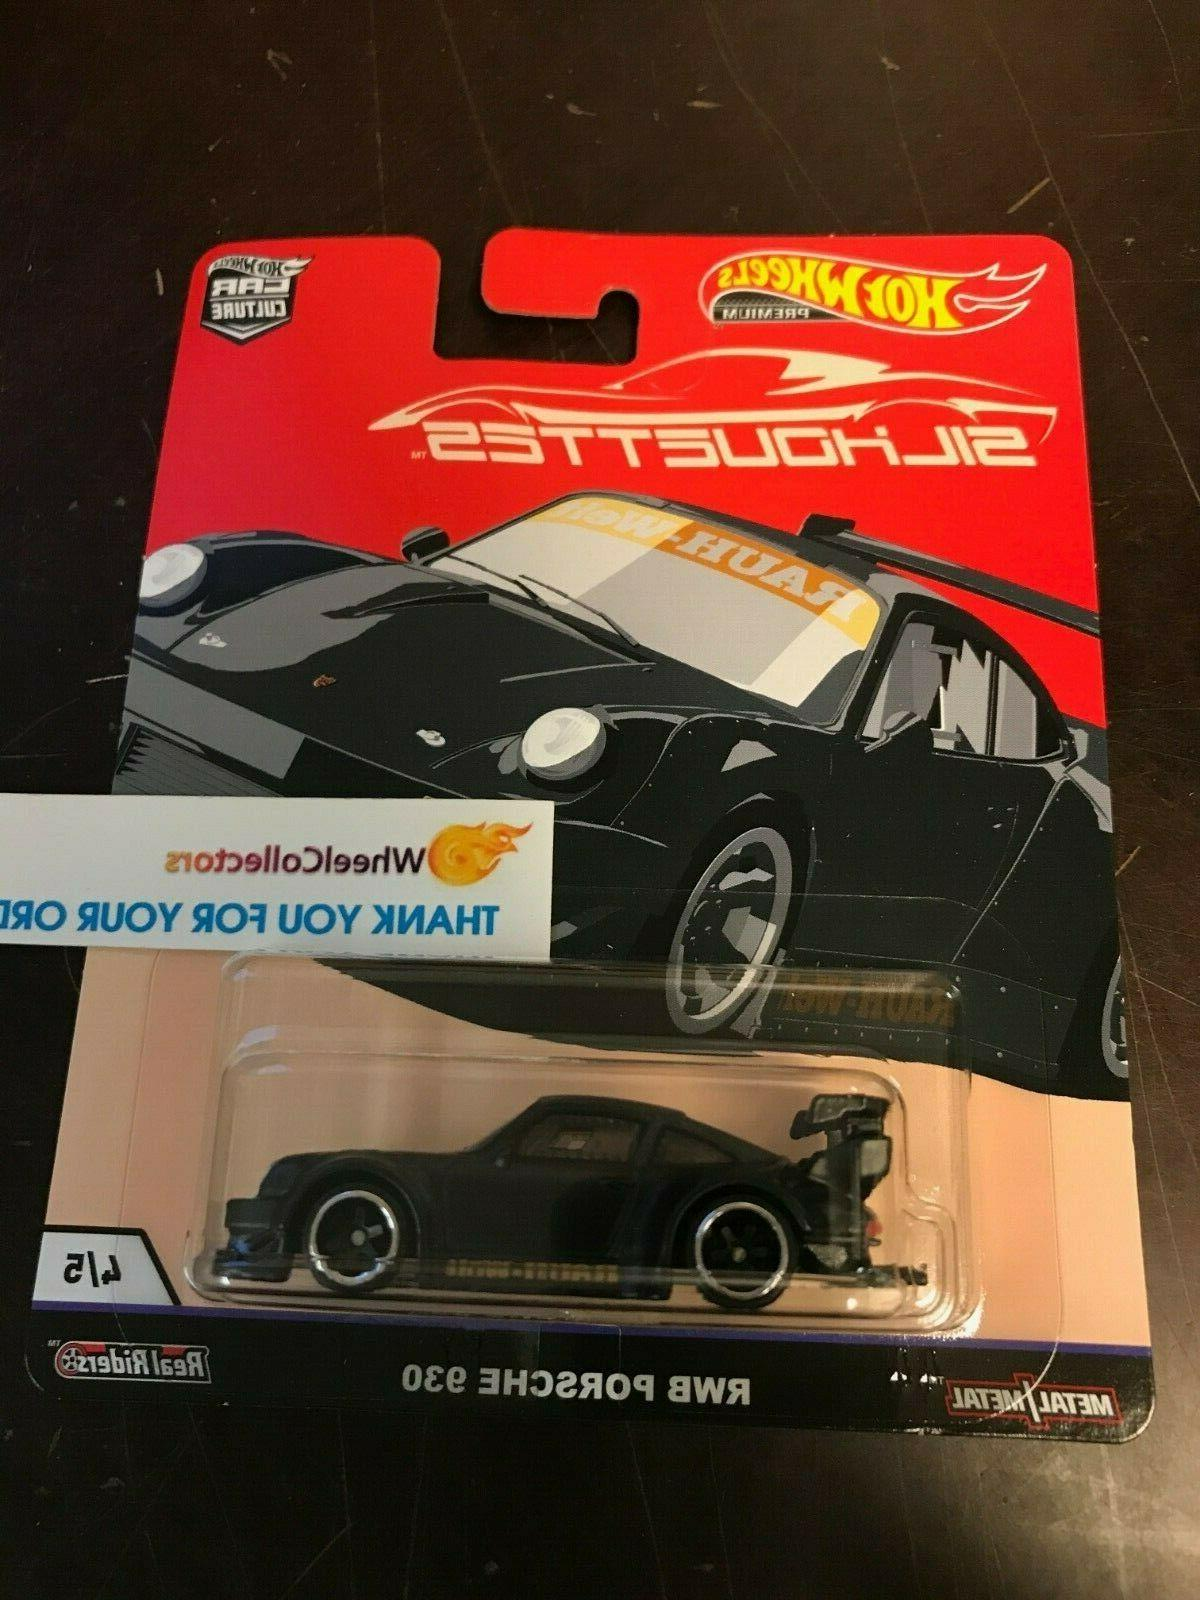 rwb porsche 930 2019 silhouettes car culture